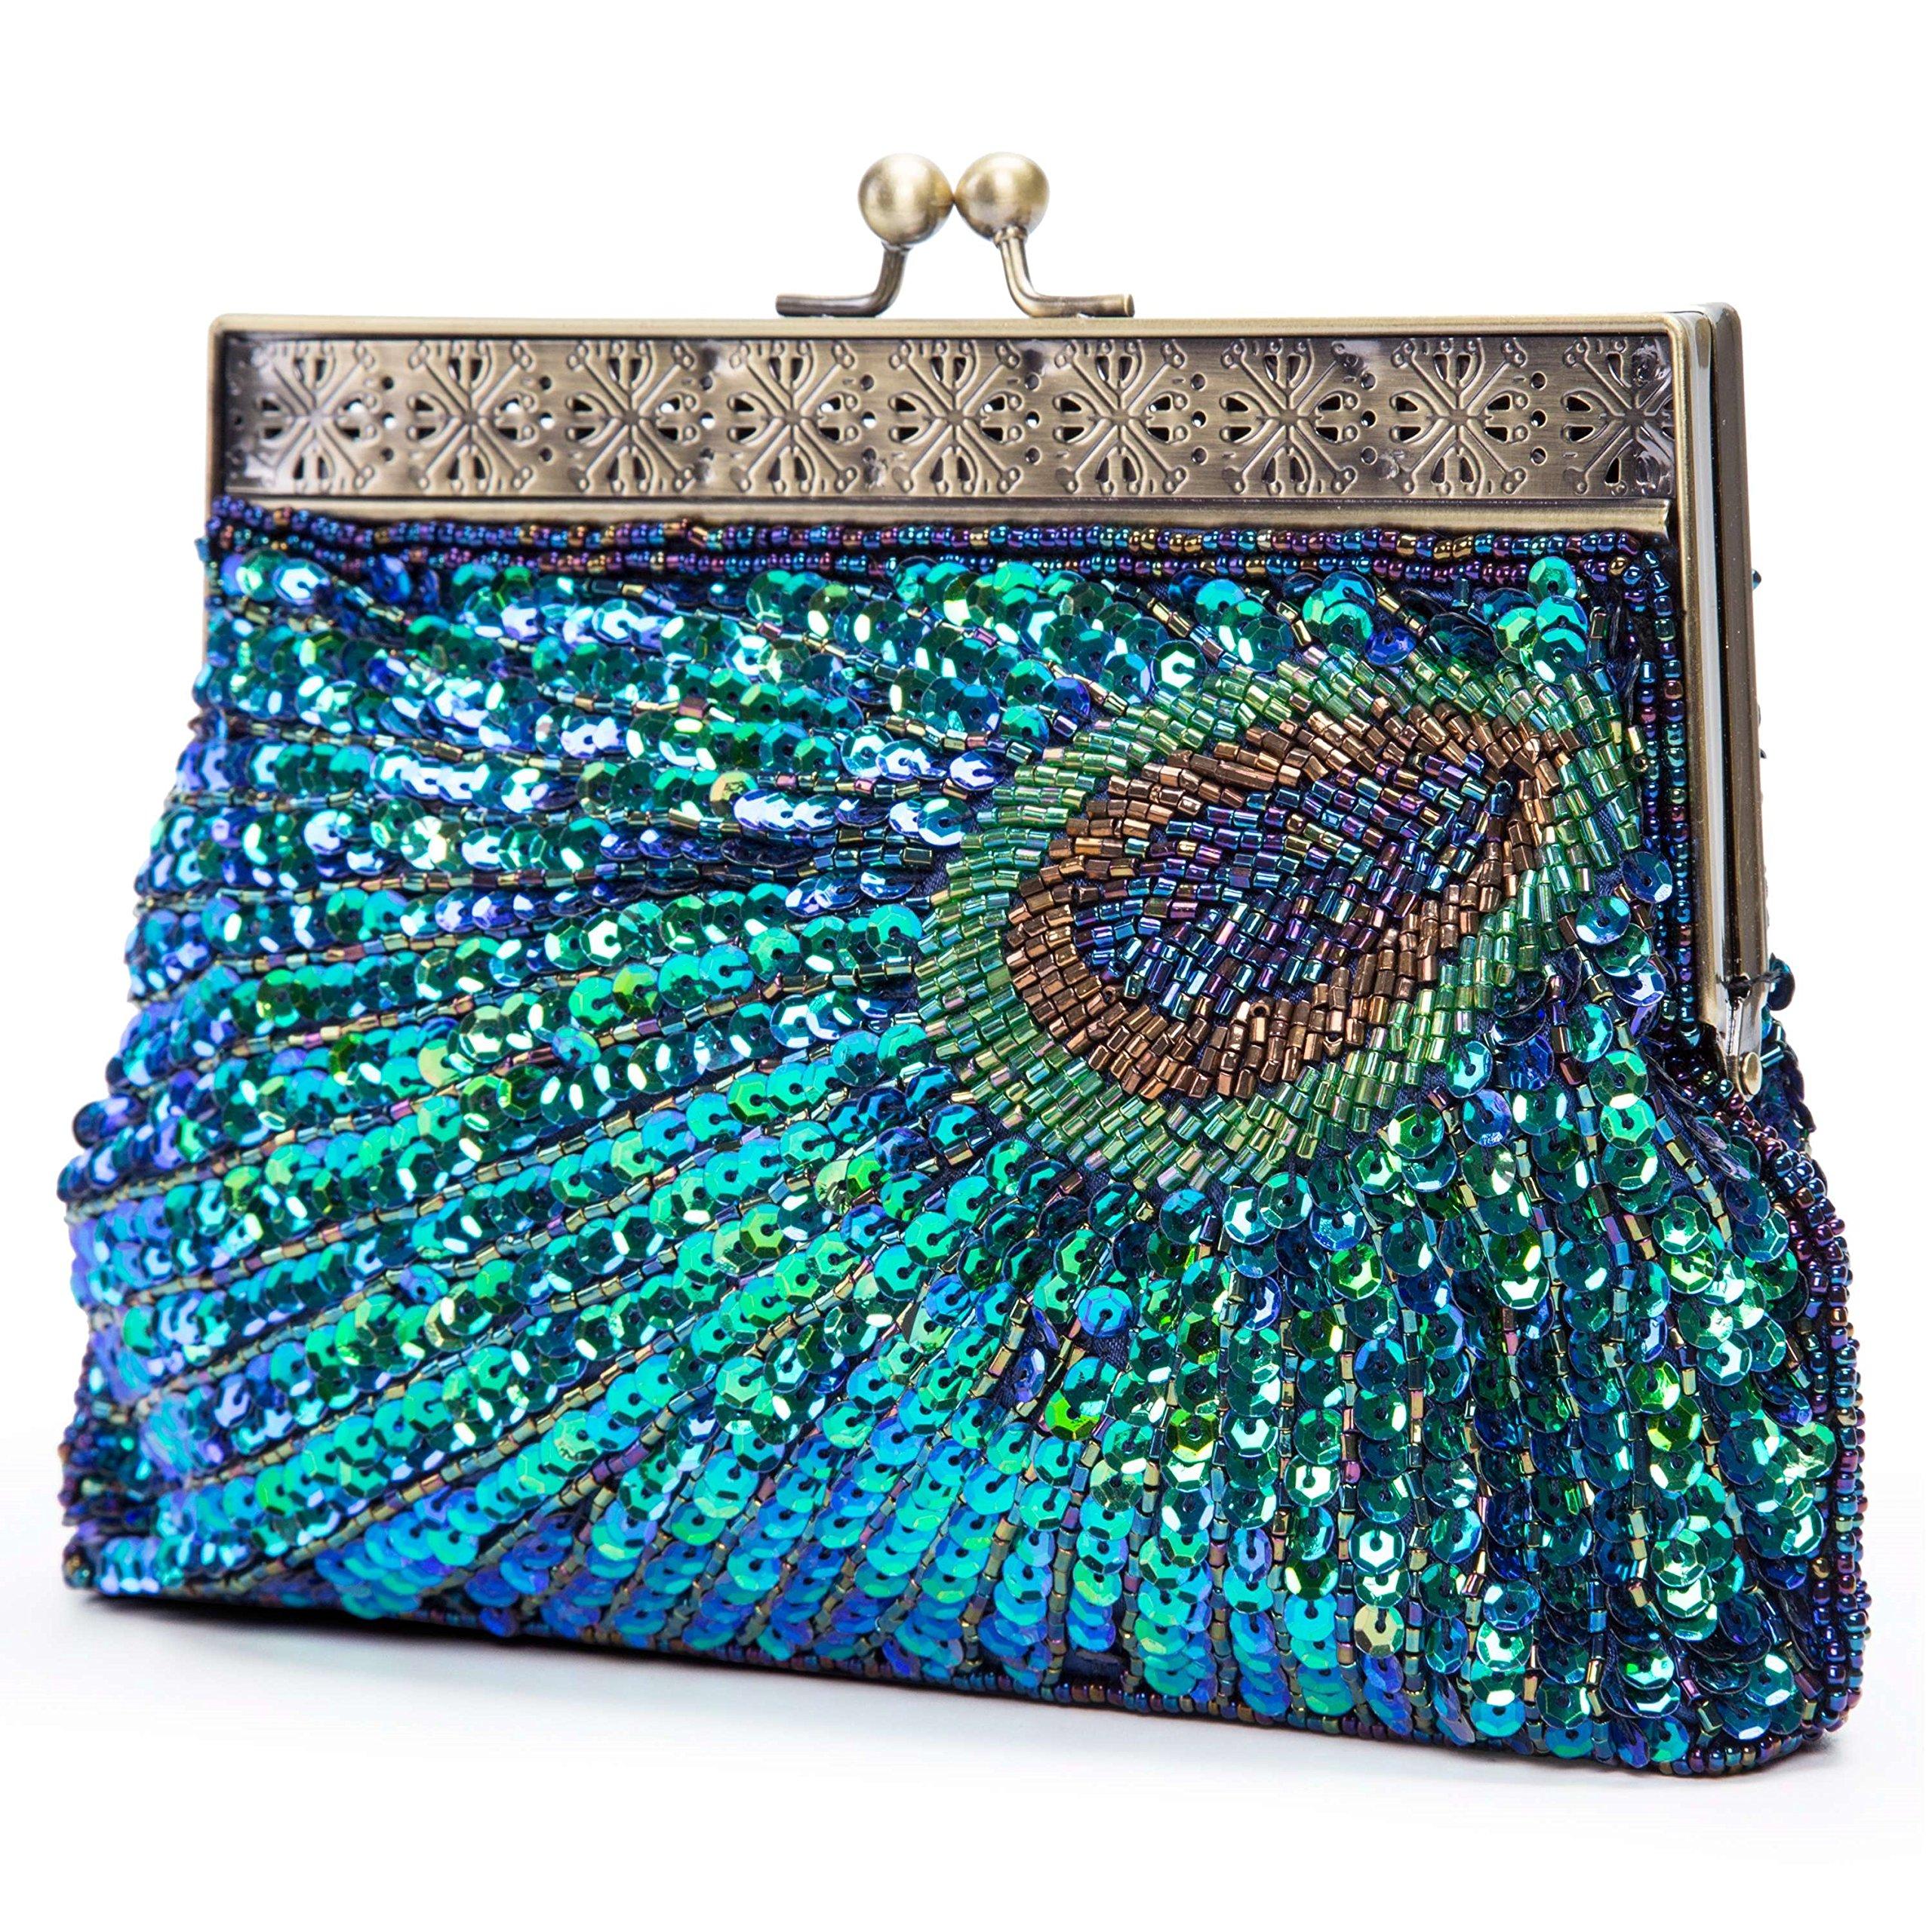 Lifewish Women's Unique Luxury Sequins Beaded Evening Bag Wedding Bridal Party Prom Clutch tote Handbag (Blue)